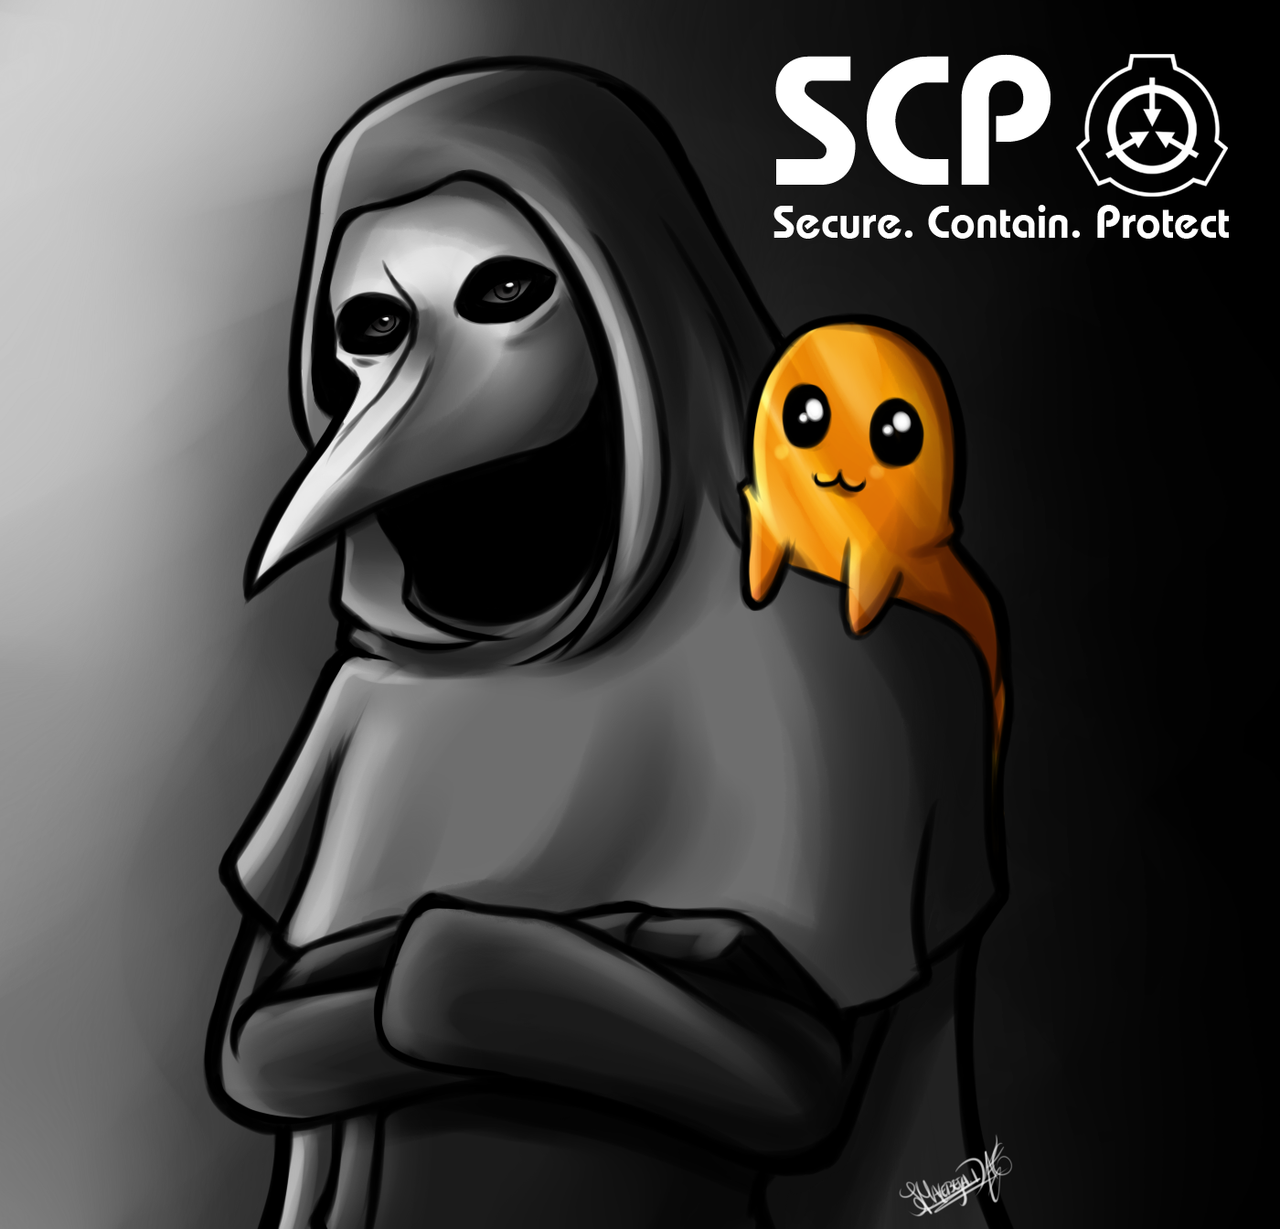 SPC-999 / SCP-049 by Malebeja deviantart com on @DeviantArt | Stuff